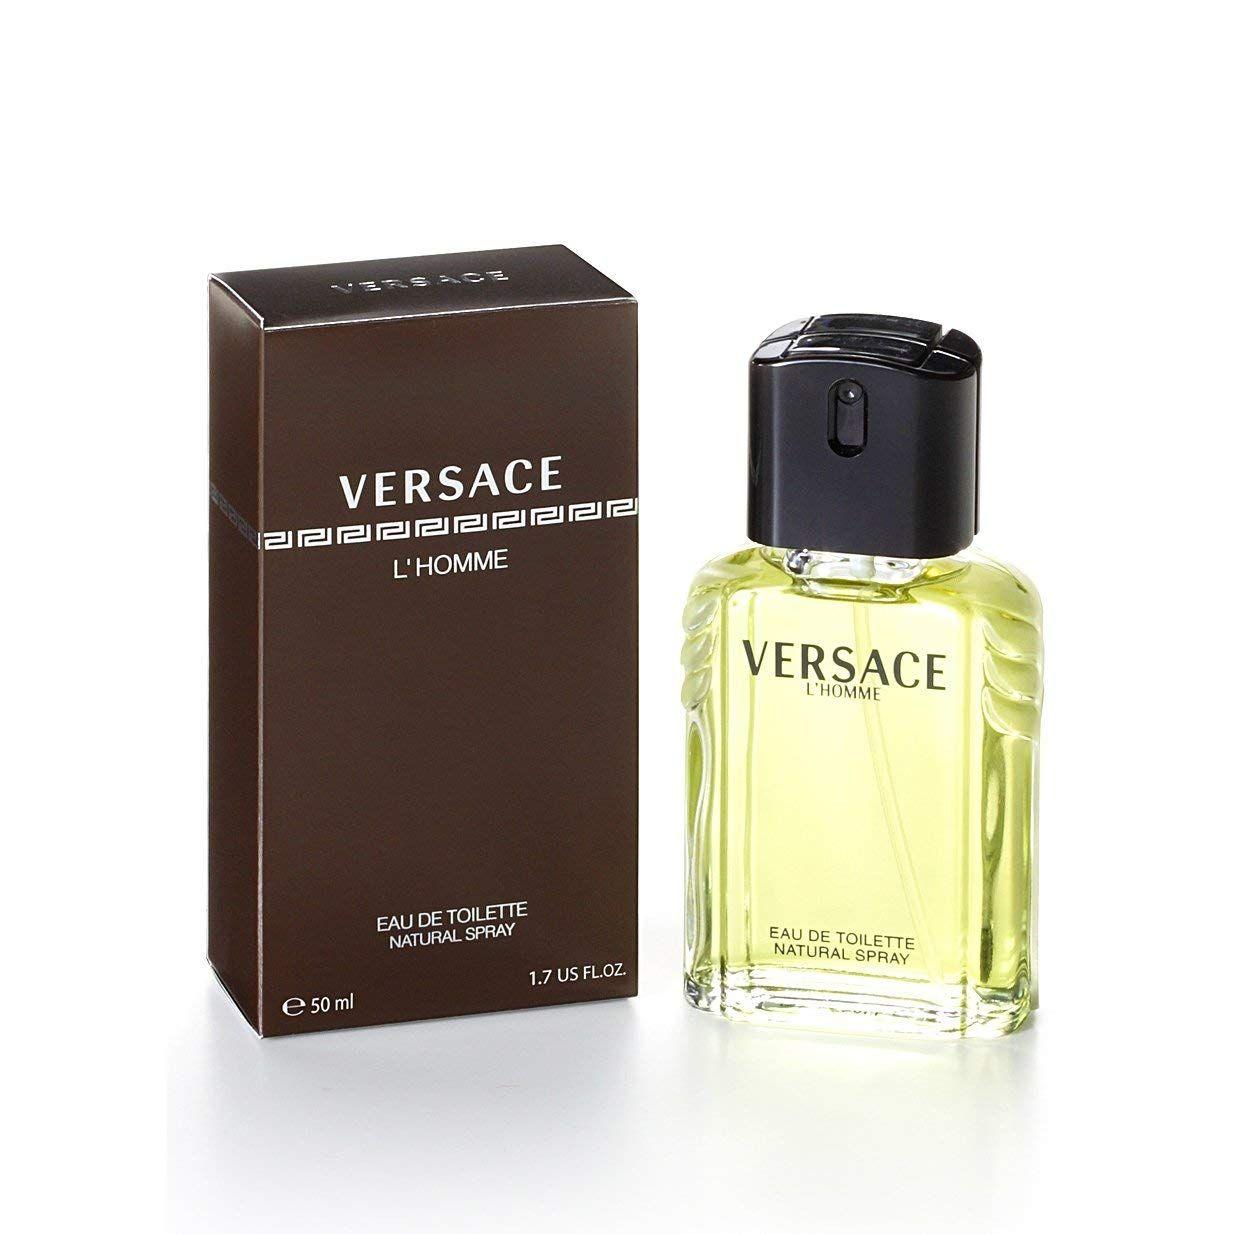 28c7abcb6d2c Versace Lhomme By Gianni Versace Edt Spray FN125083 3.4 oz men ...